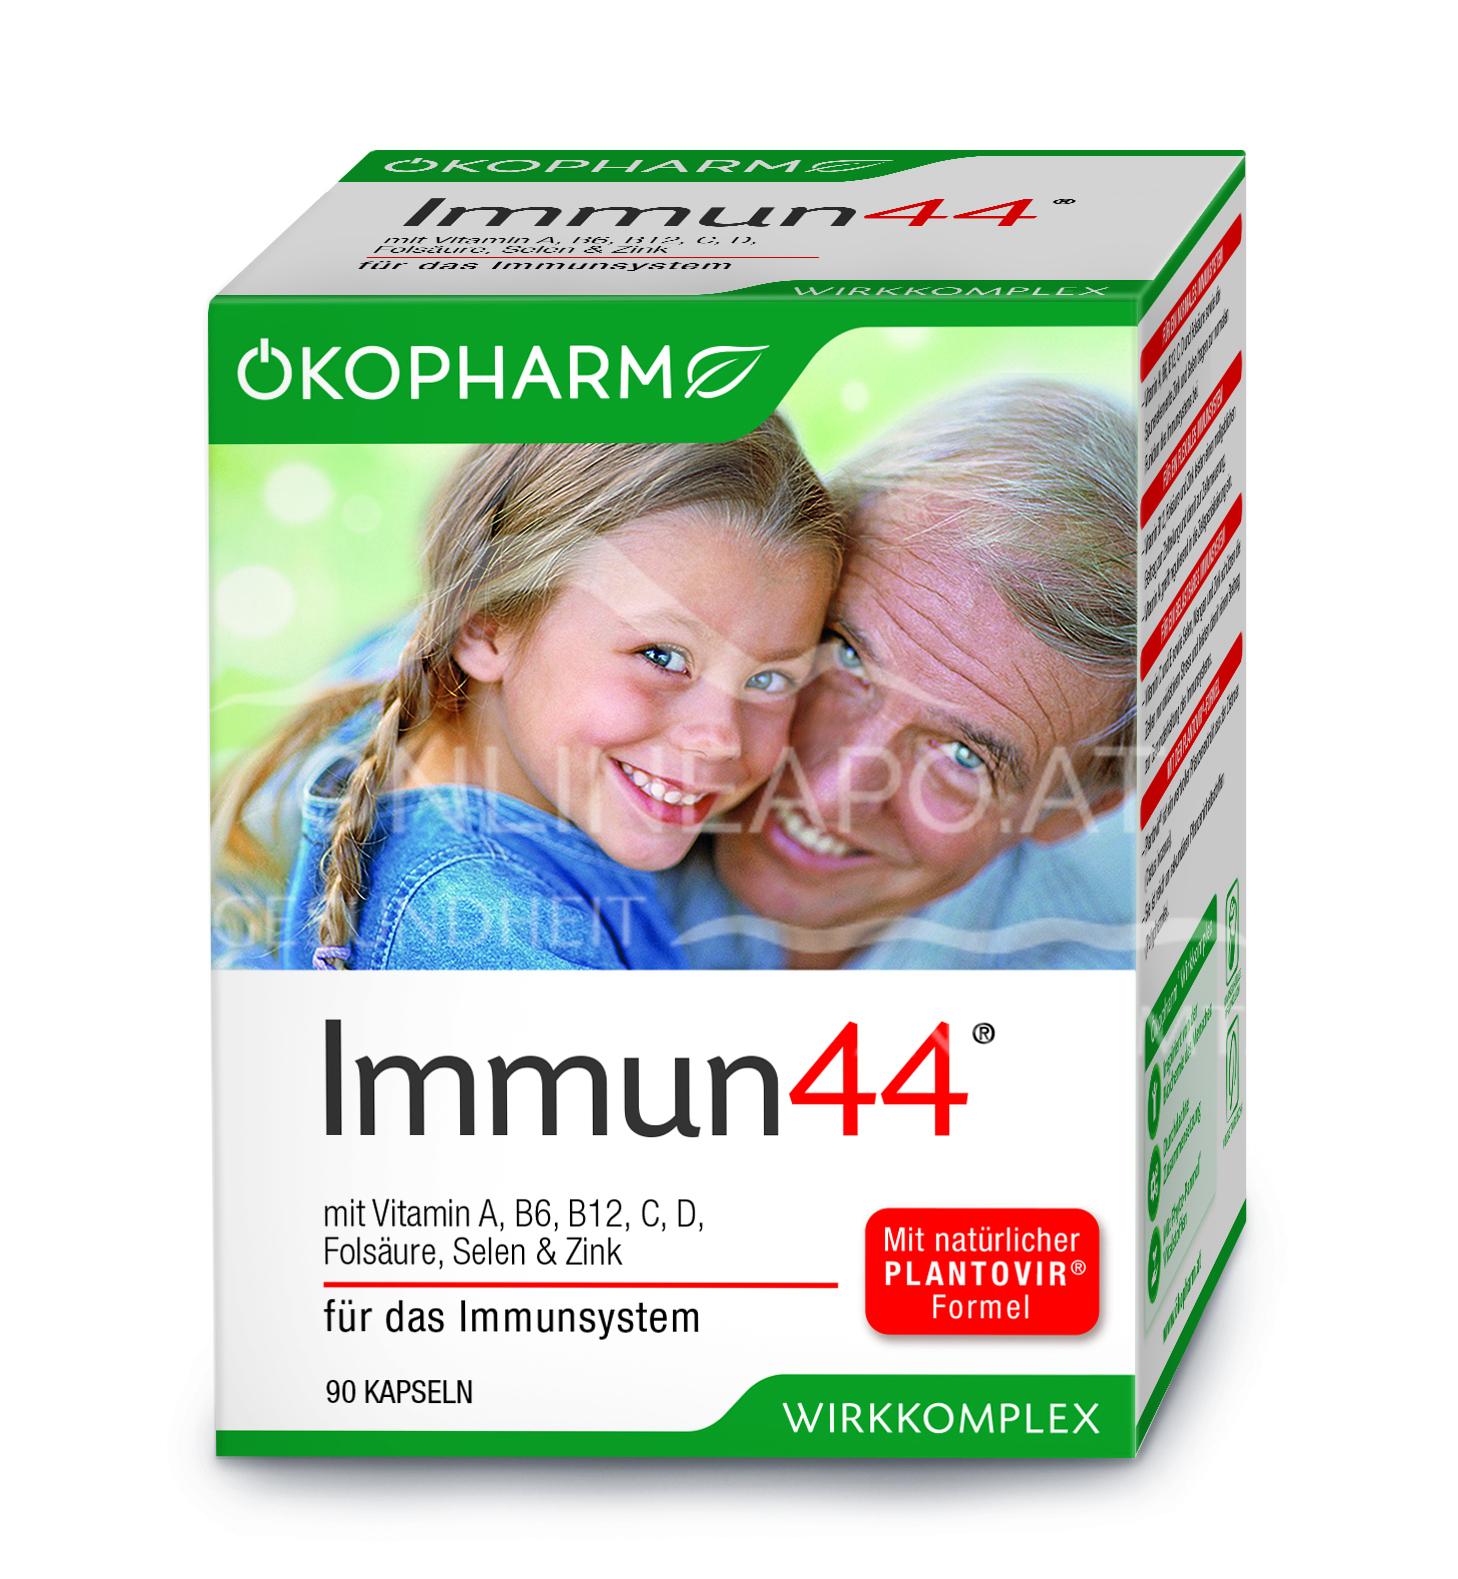 Ökopharm Immun44® Kapseln